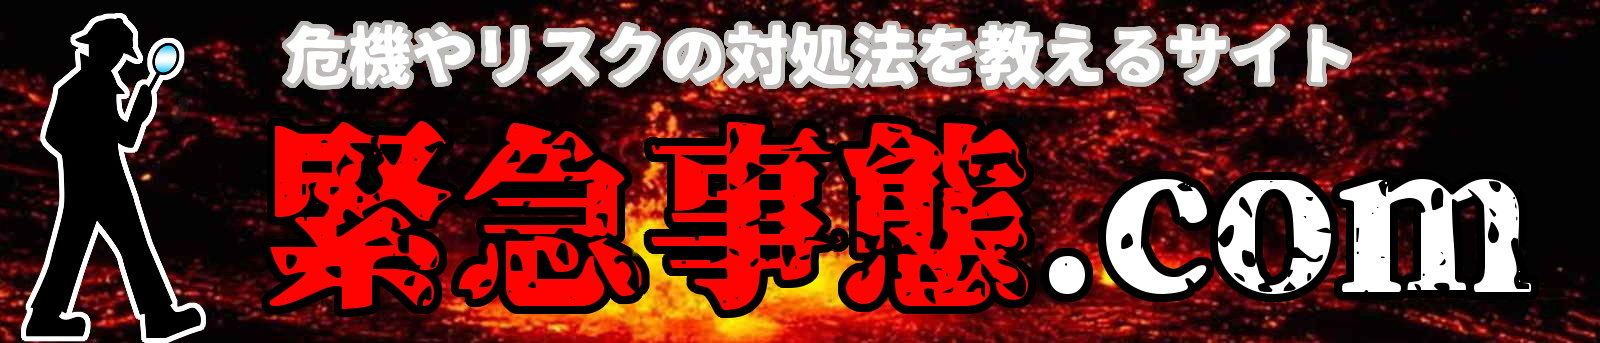 緊急事態.com